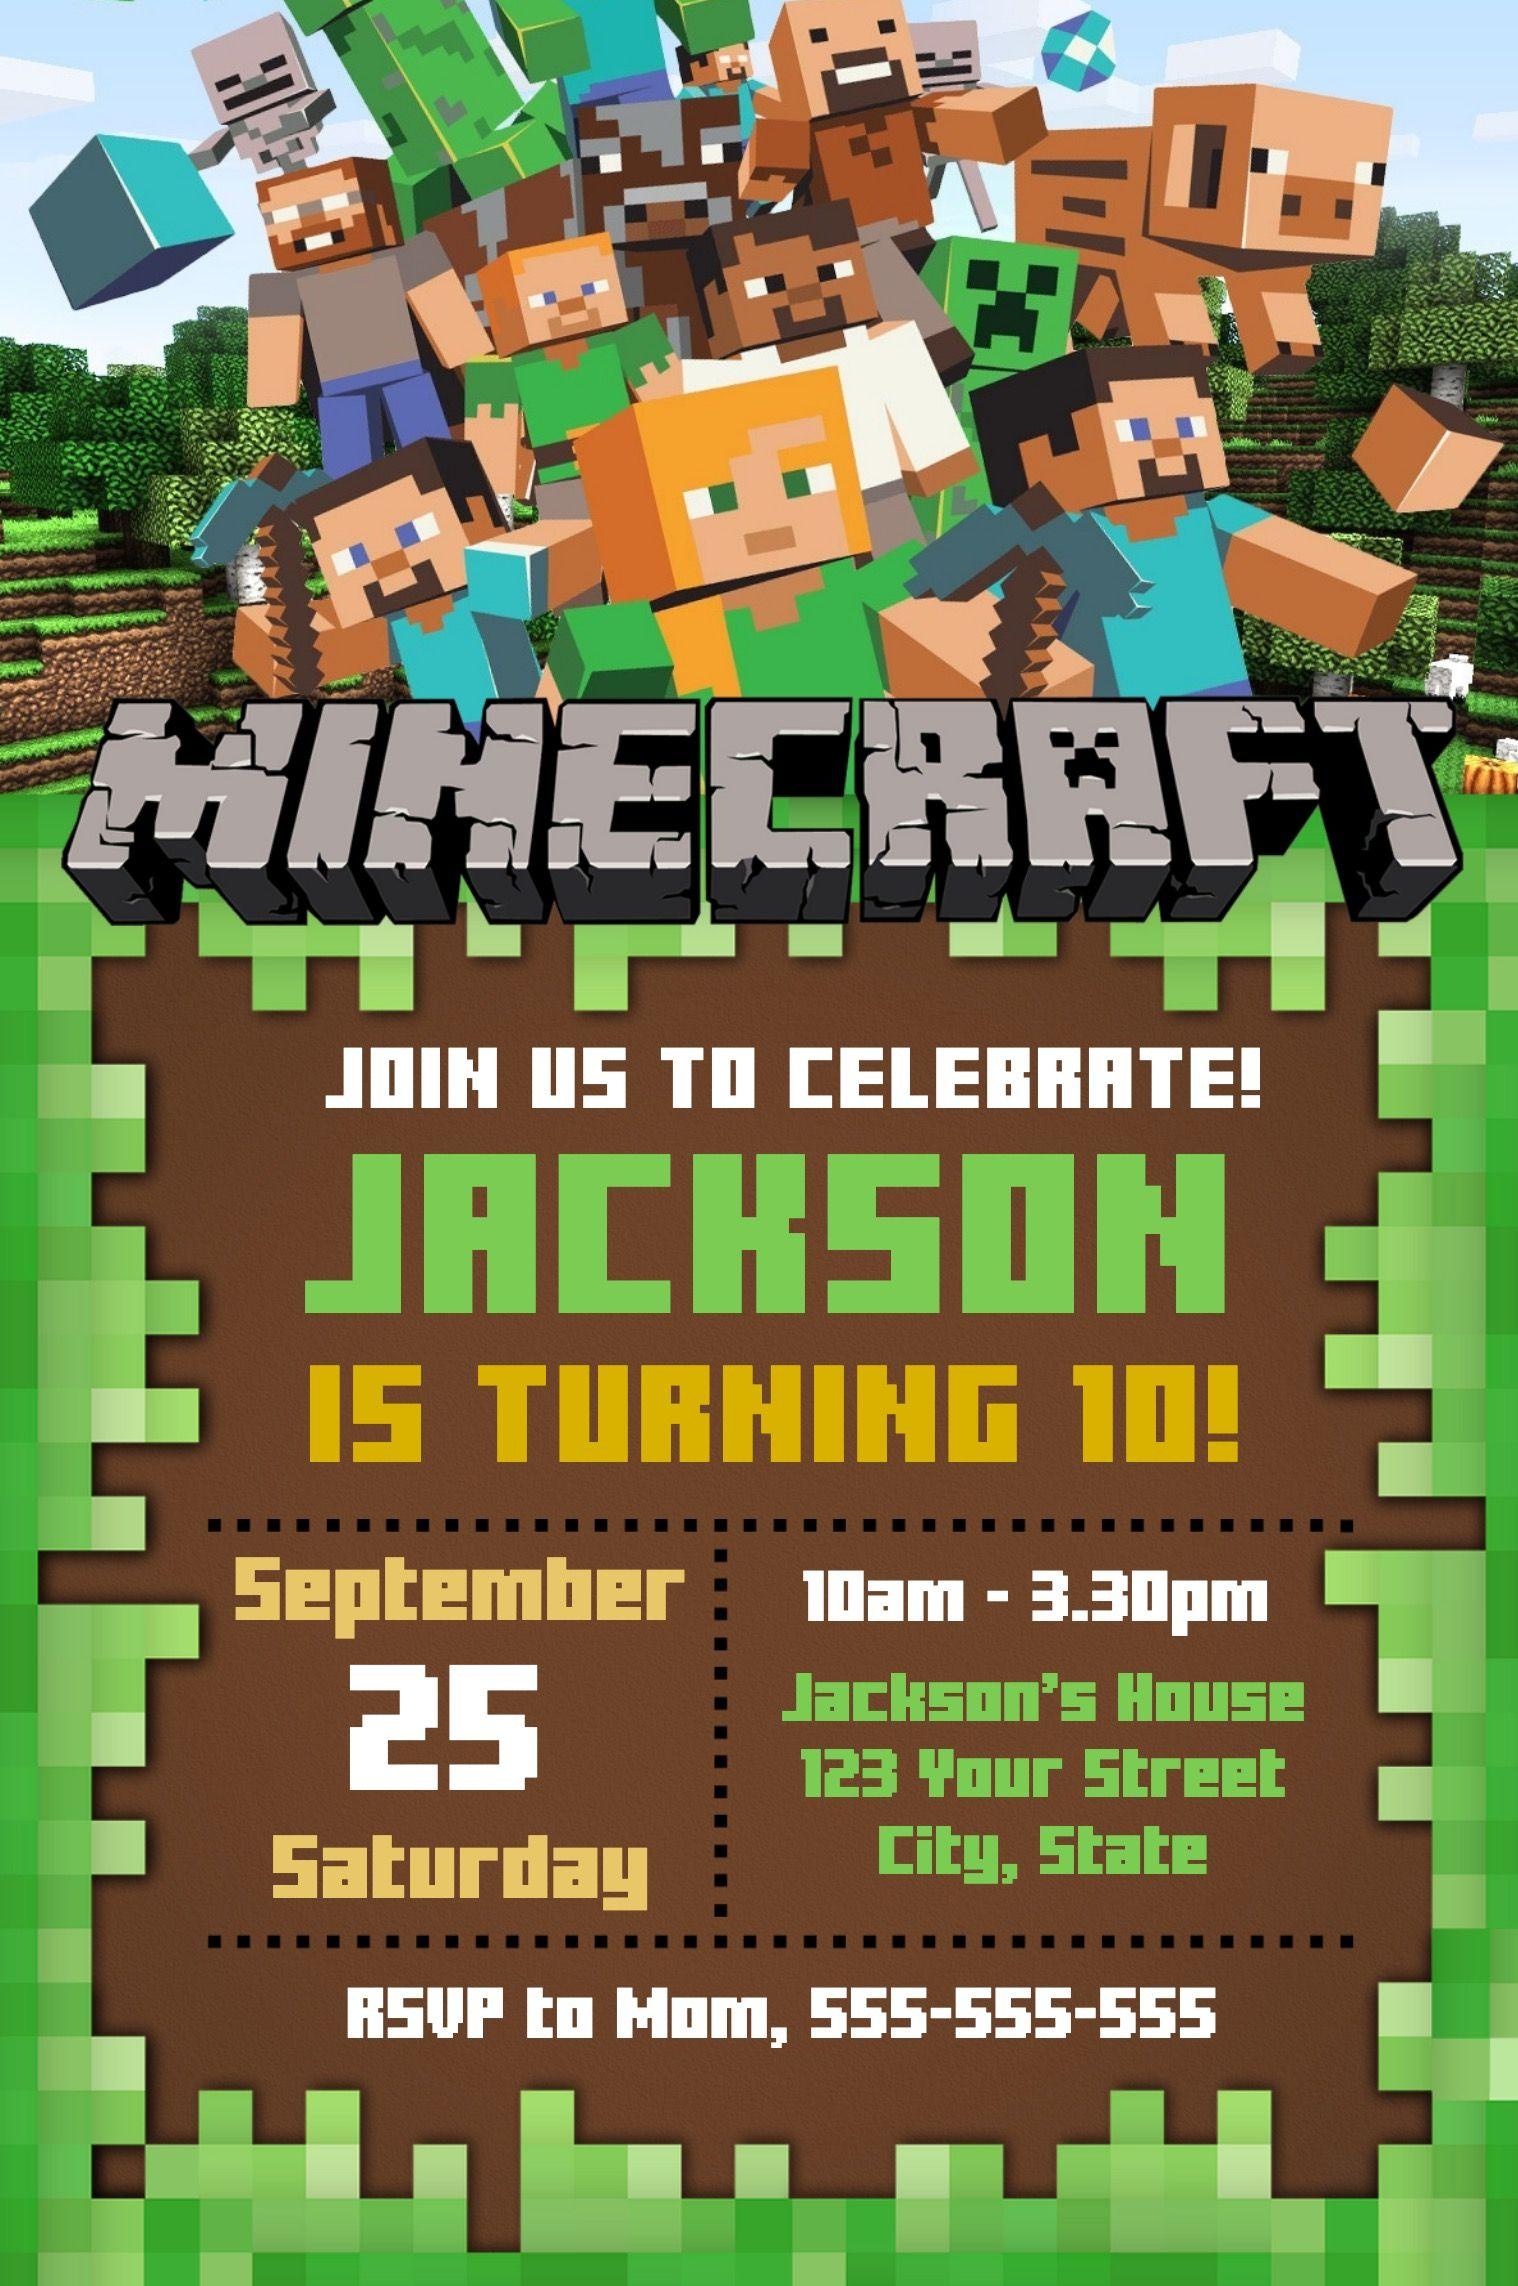 Editable Minecraft Invitation Online Invitation Maker Indigo Invites In 2021 Minecraft Invitations Minecraft Party Invitations Minecraft Birthday Invitations Minecraft birthday invitation template free